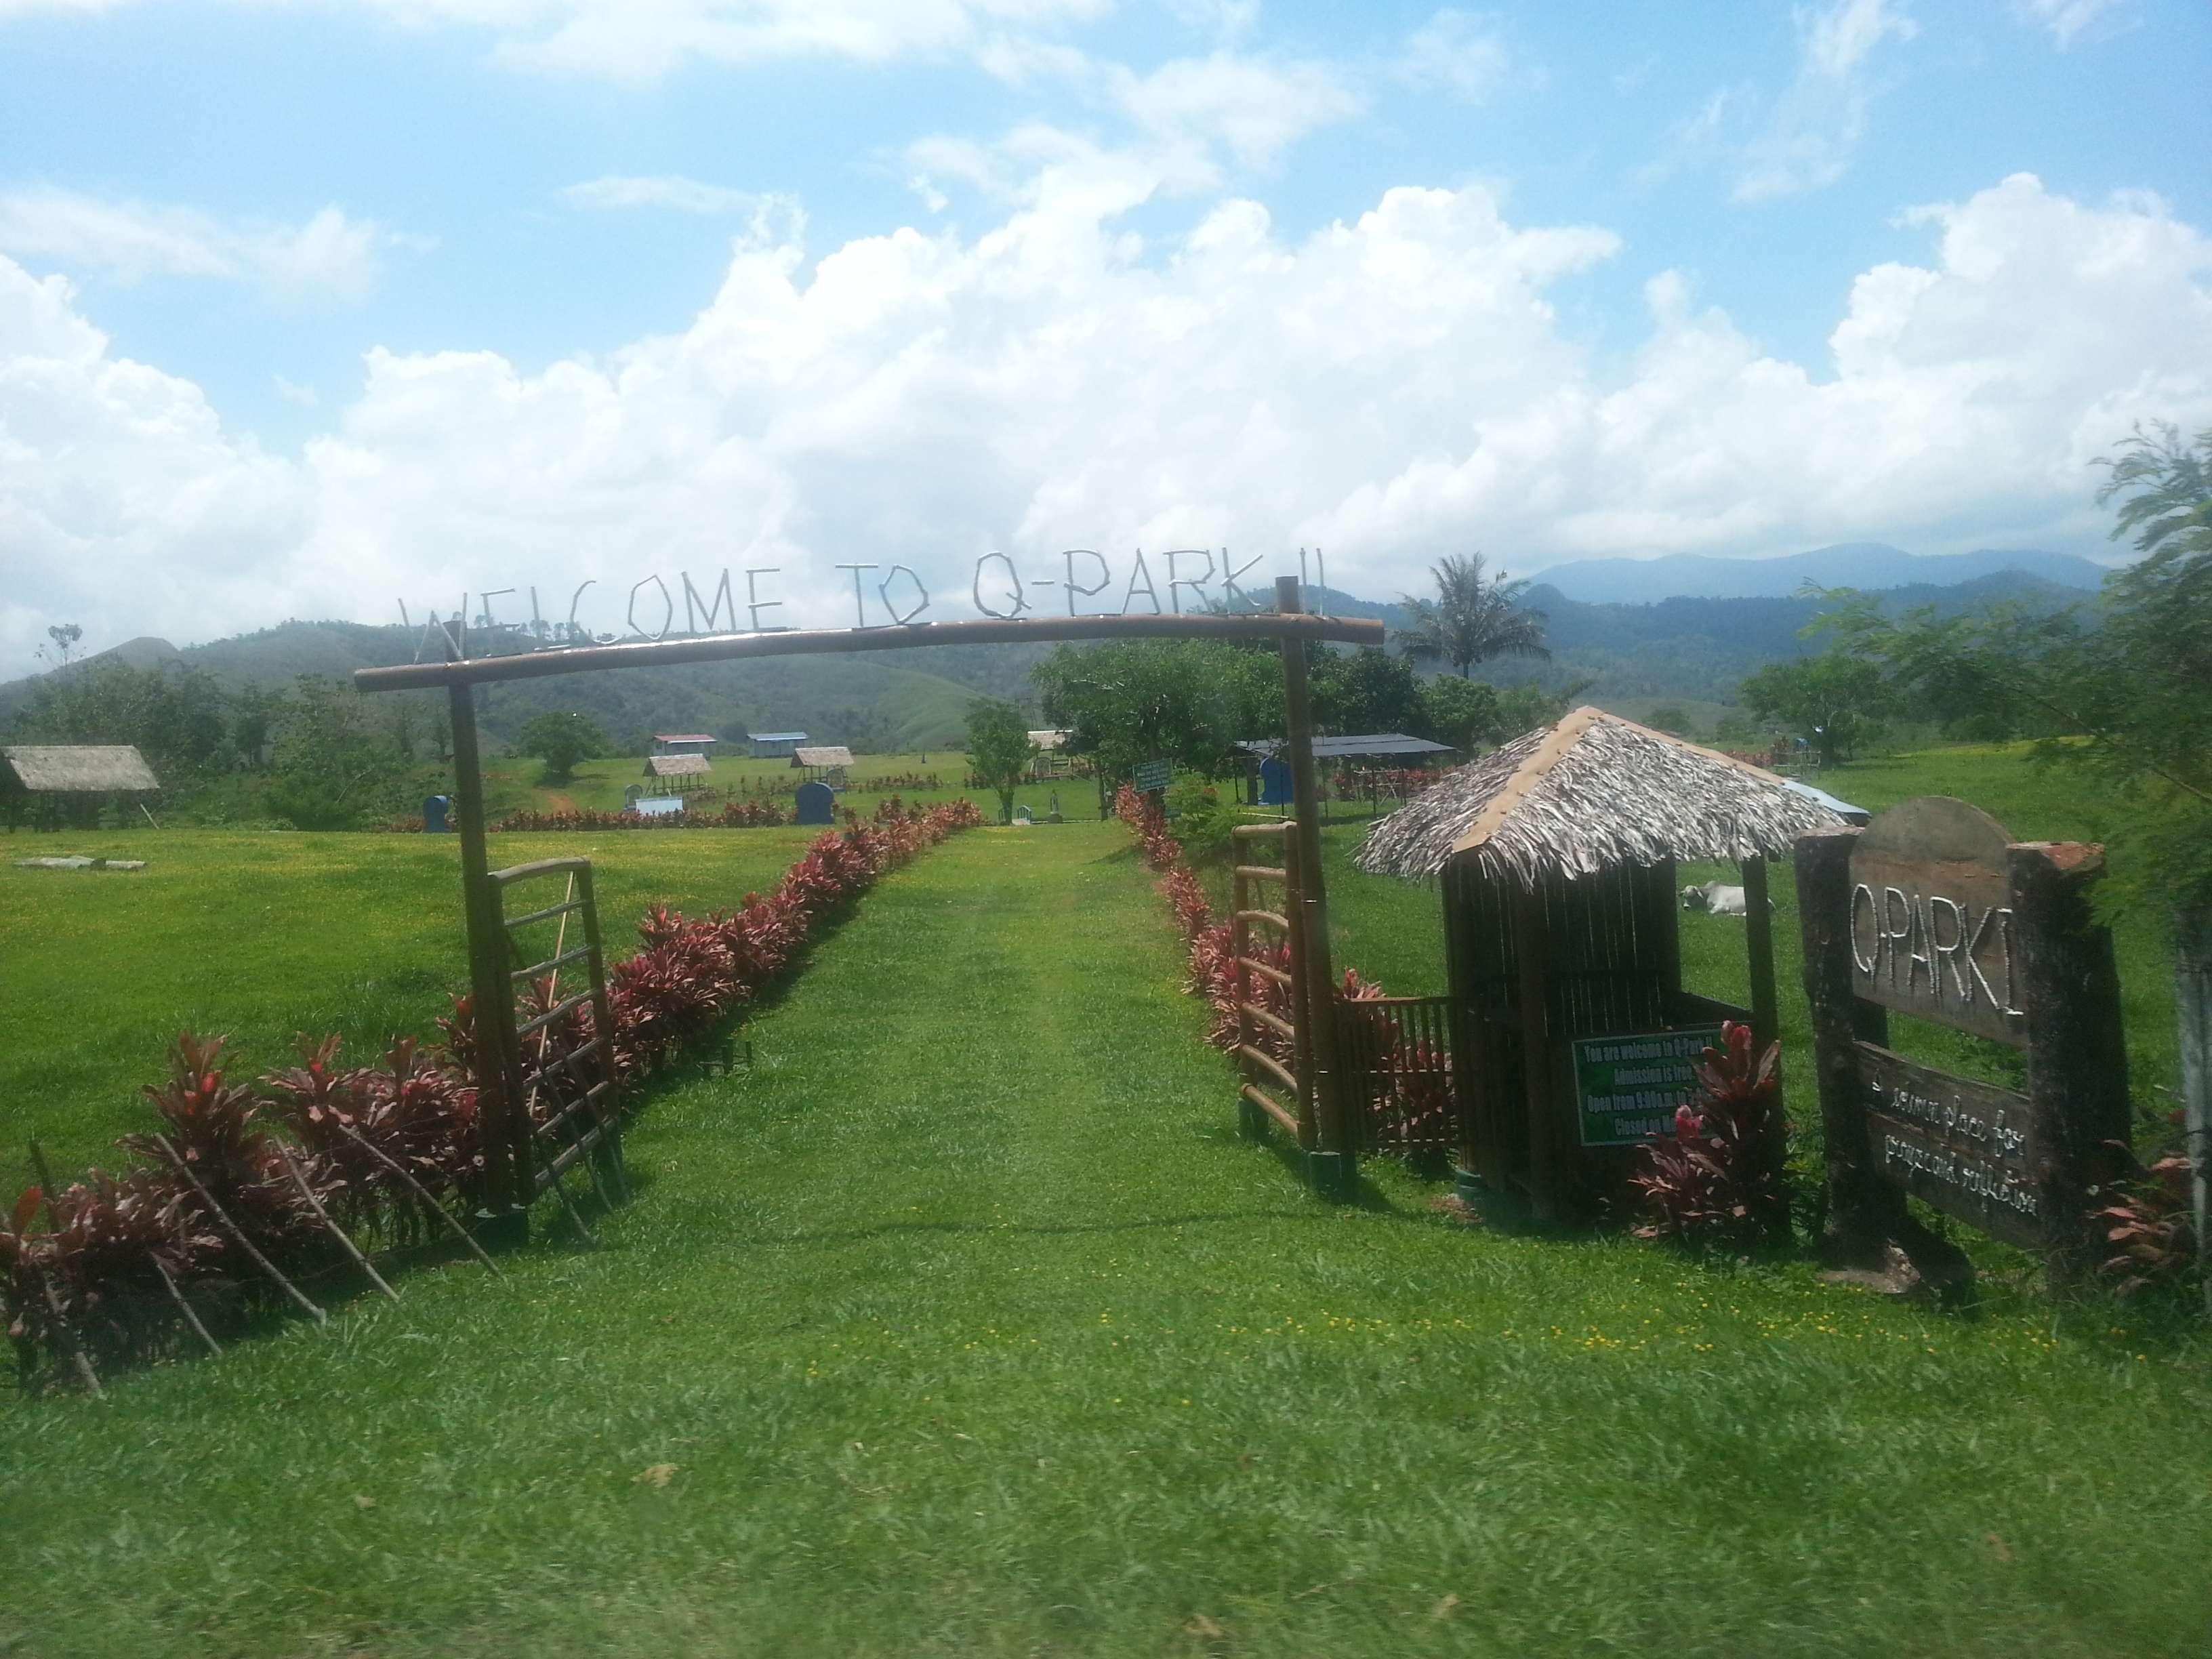 malaybalay q park ii